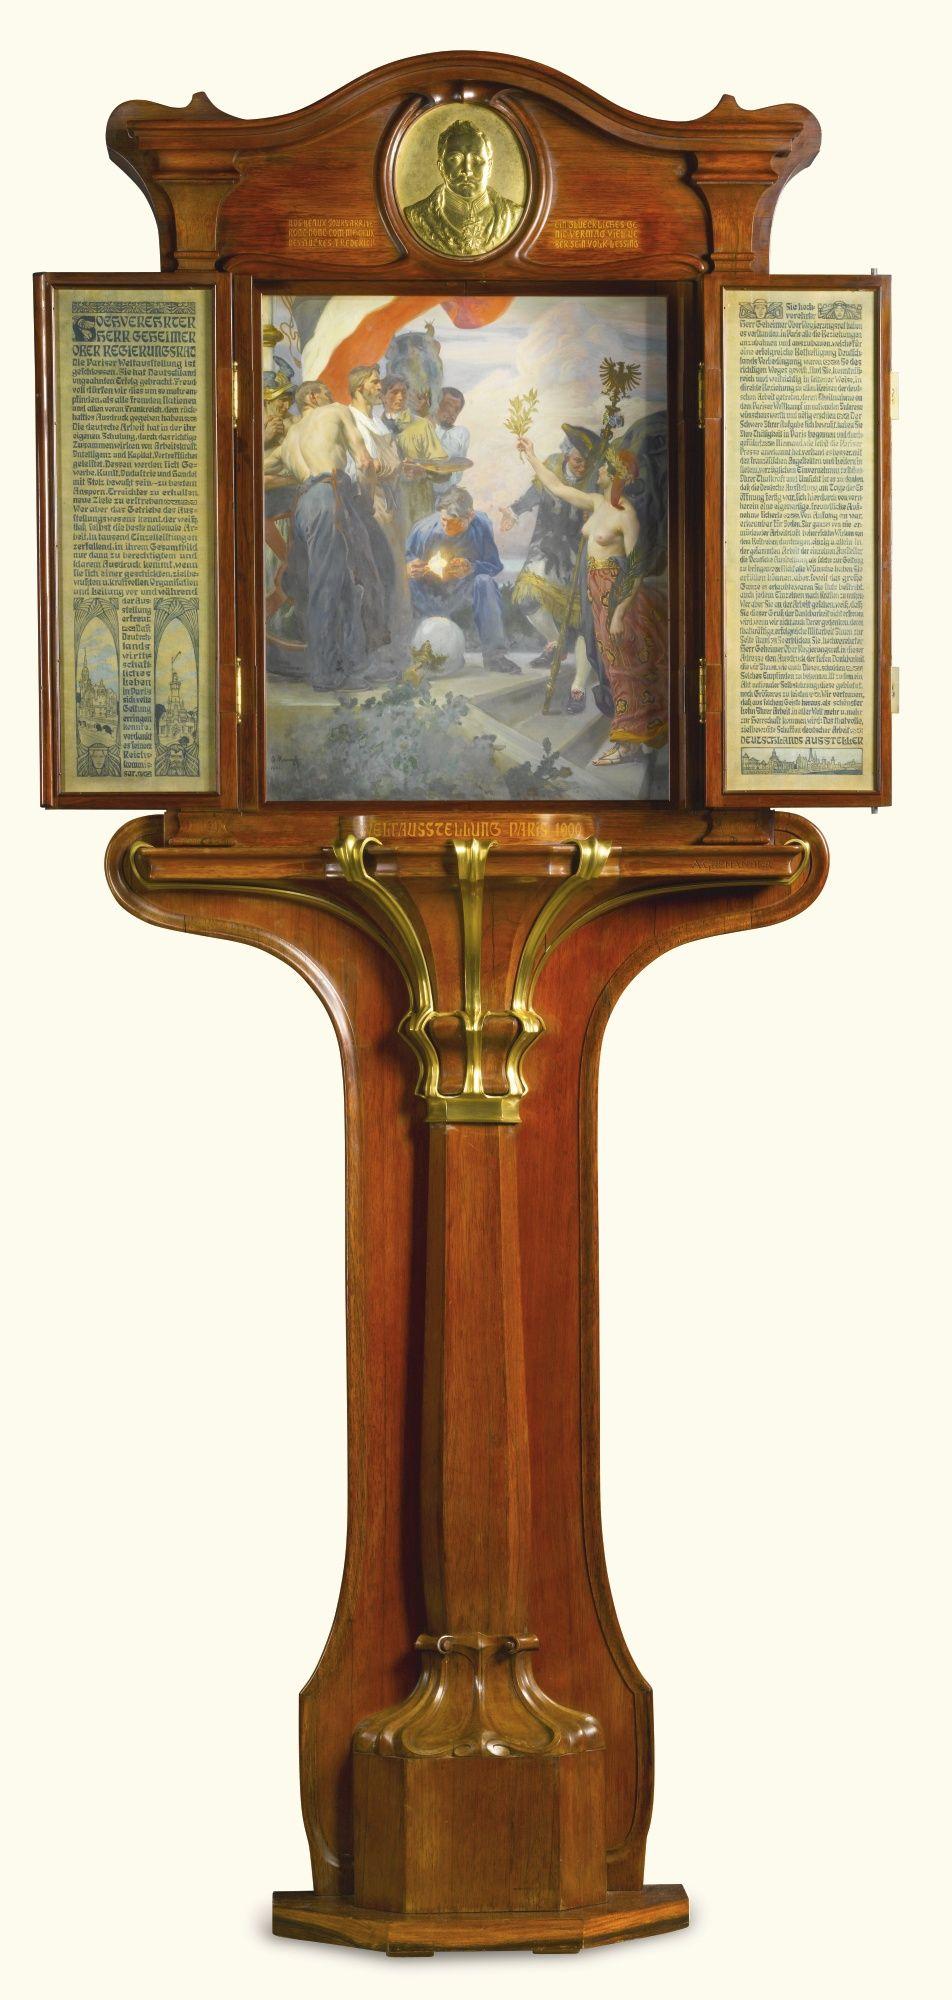 The Weltausstellungs Schrank A German Art Nouveau Gilt Bronze And Brass Mounted Rosewood Commemorative Tryptic Berlin With Images Art Nouveau German Art Antique Wall Clock